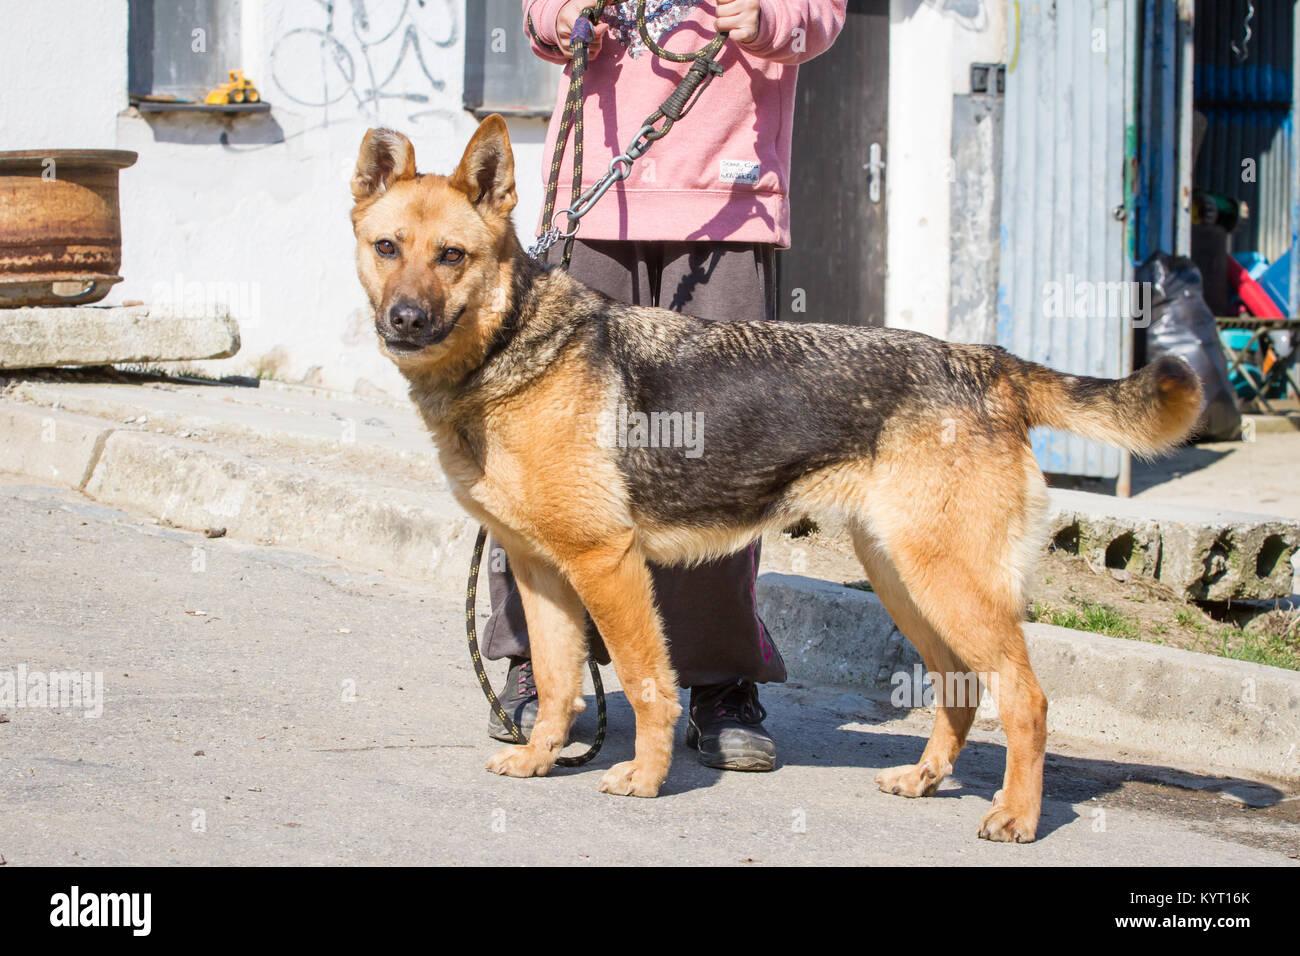 Abused German Shepherd hybrid dog in a shelter - Stock Image